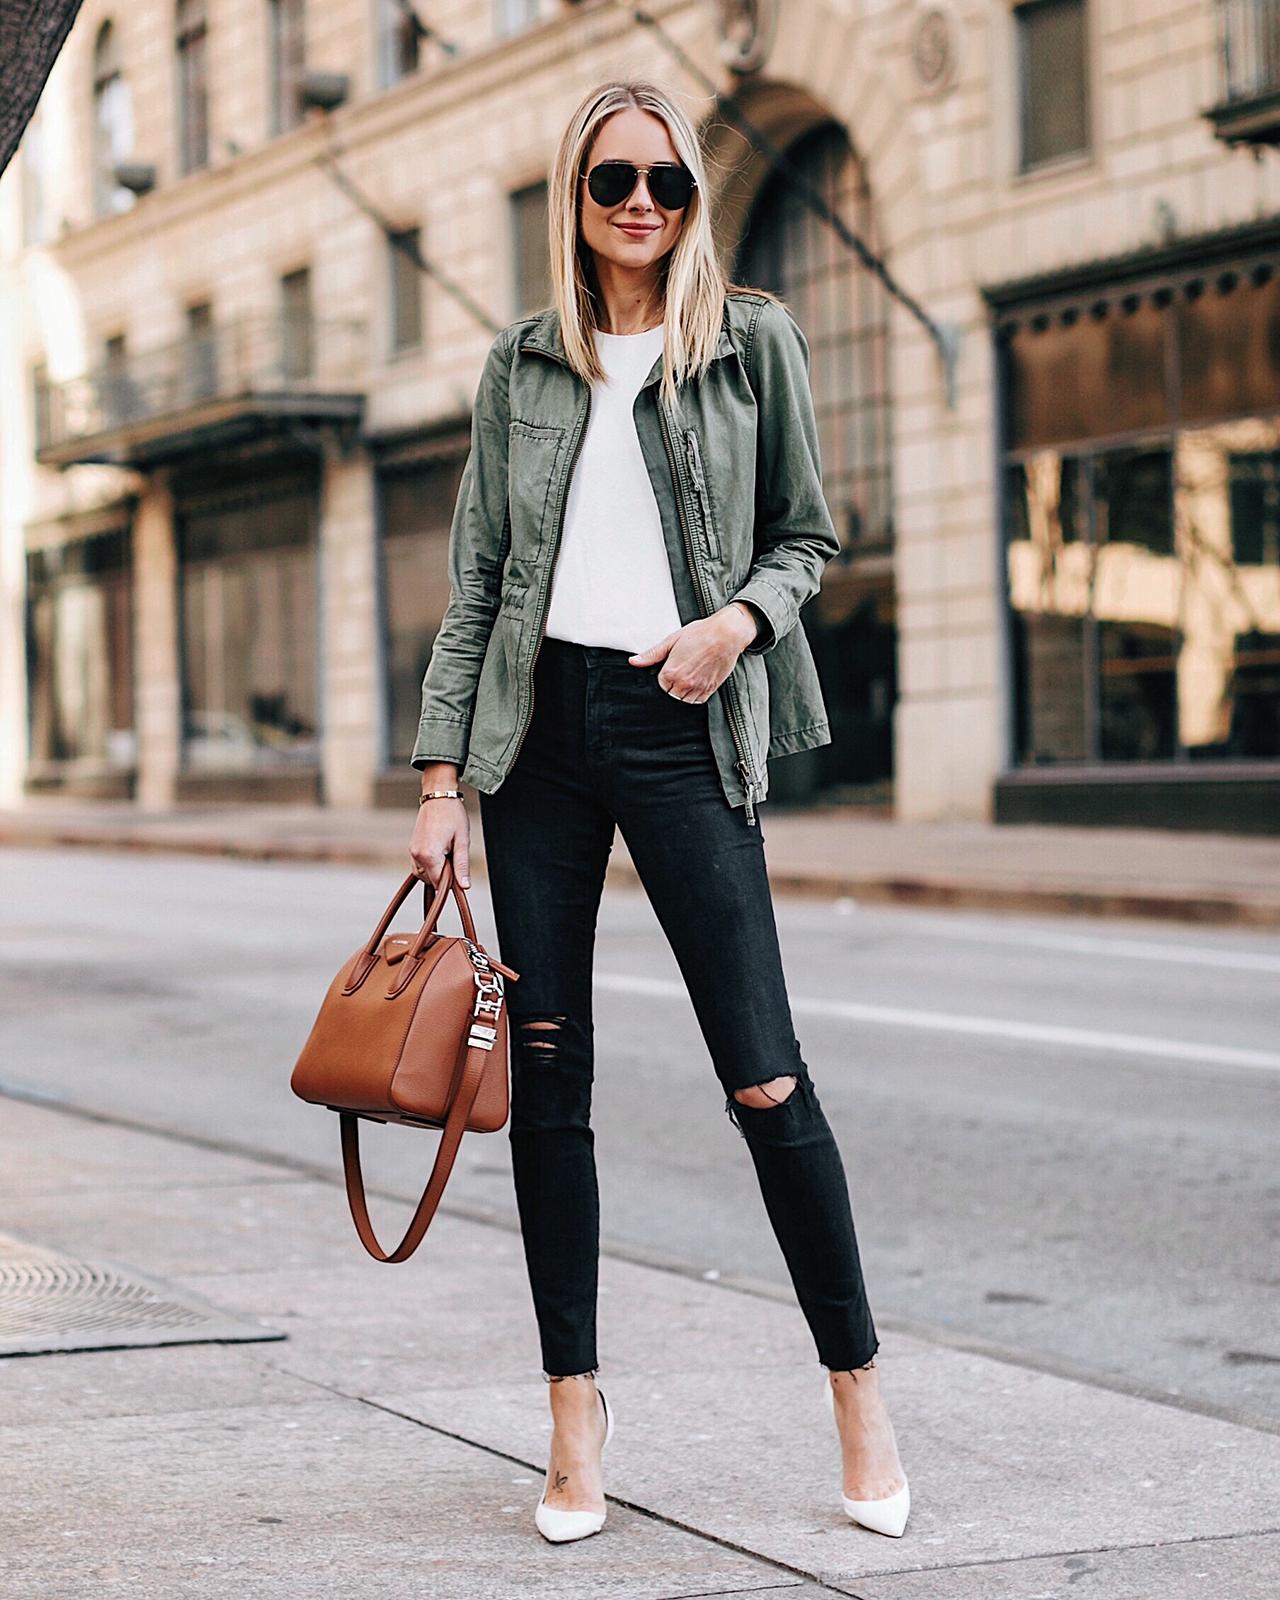 Fashion Jackson Wearing Green Utility Jacket White Top Black Ripped Skinny Jeans White Pumps